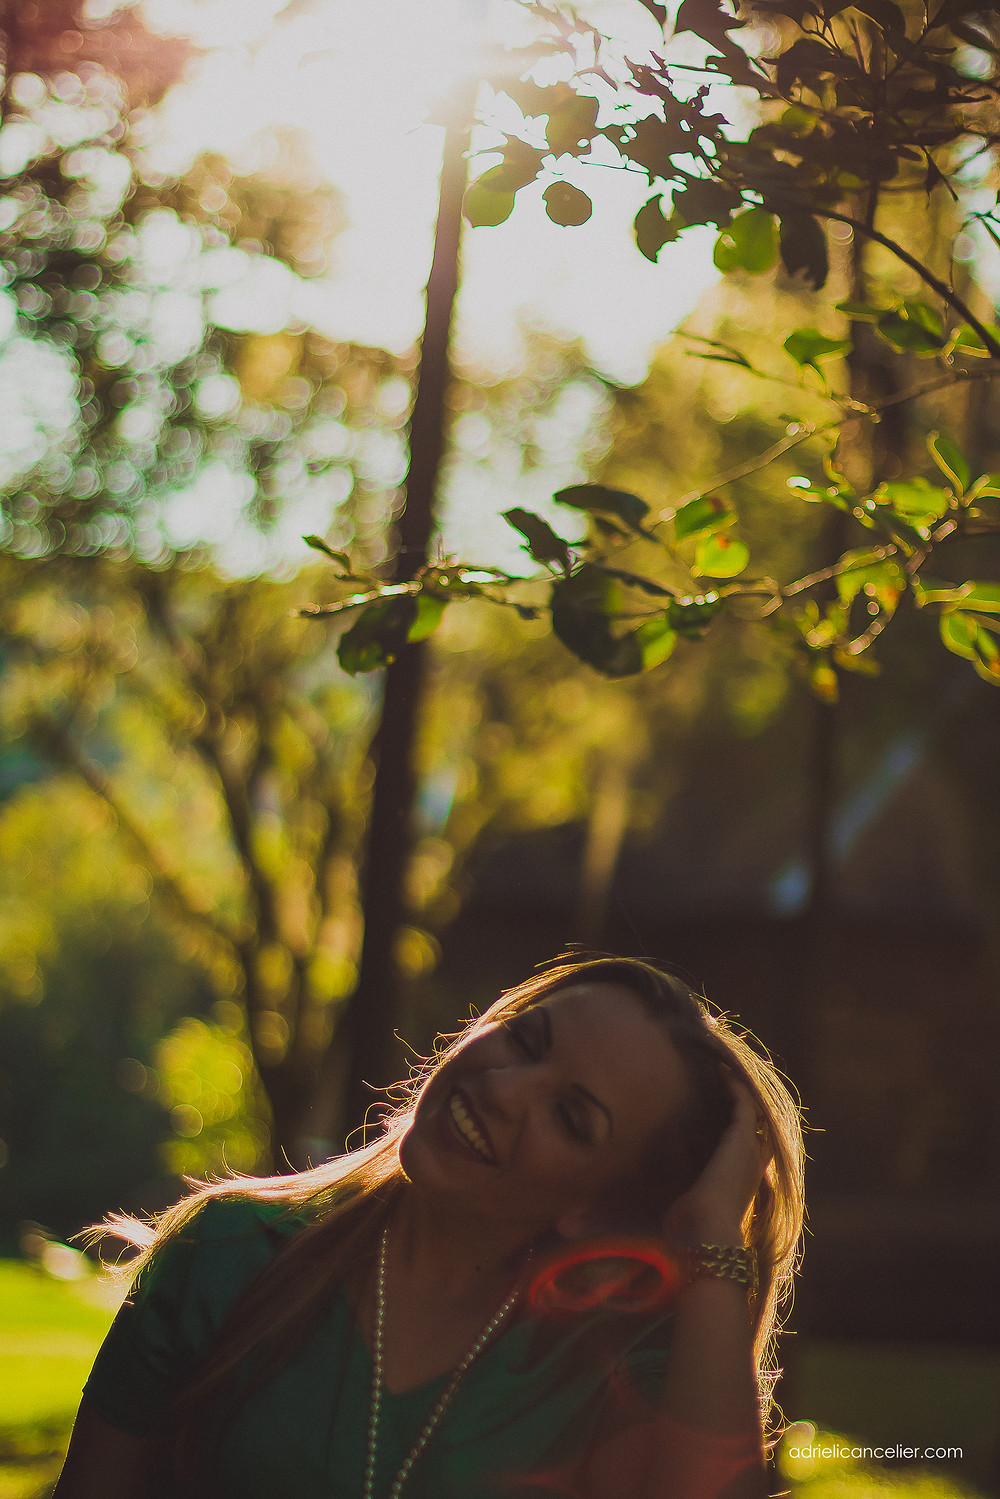 book feminino em curitiba, fotografia feminina em curitiba, fotógrafo em curitiba, ensaio fotográfico feminino, adrieli cancelier, fotografia de família em curitiba